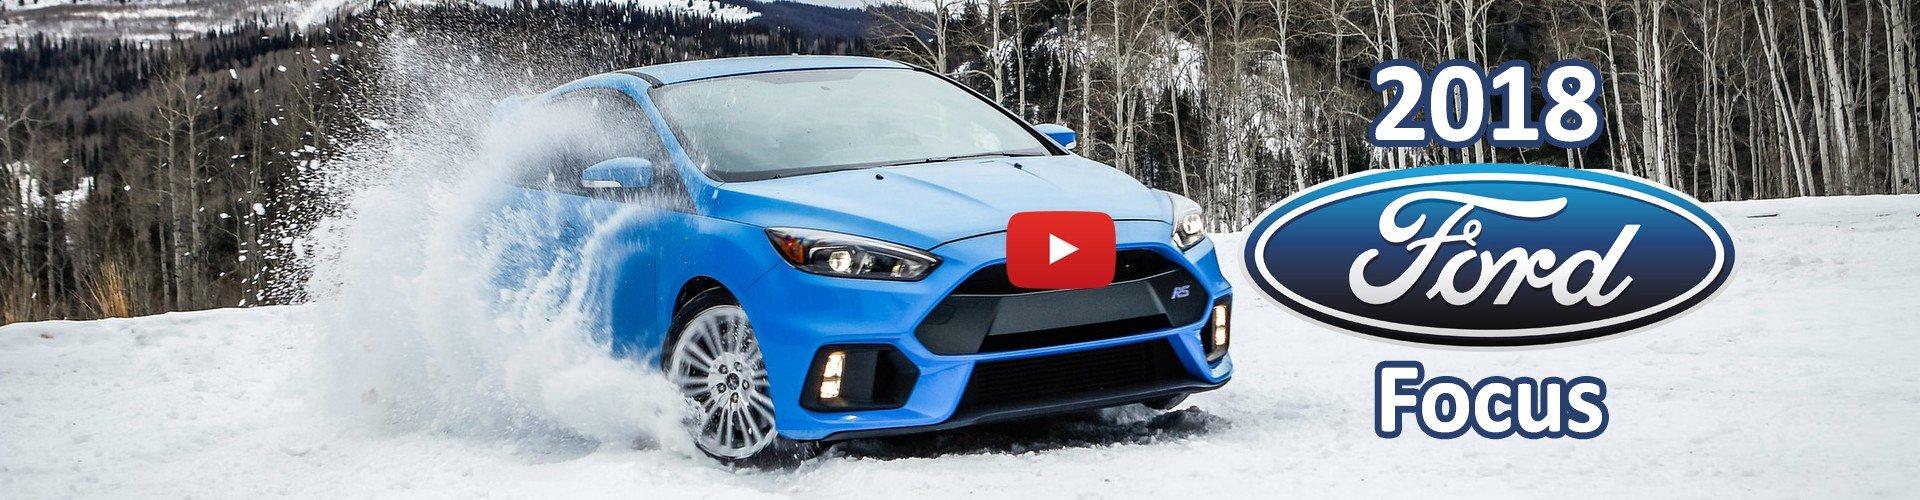 Kitchener Ford | New & Used Car Dealership in Kitchener, ON